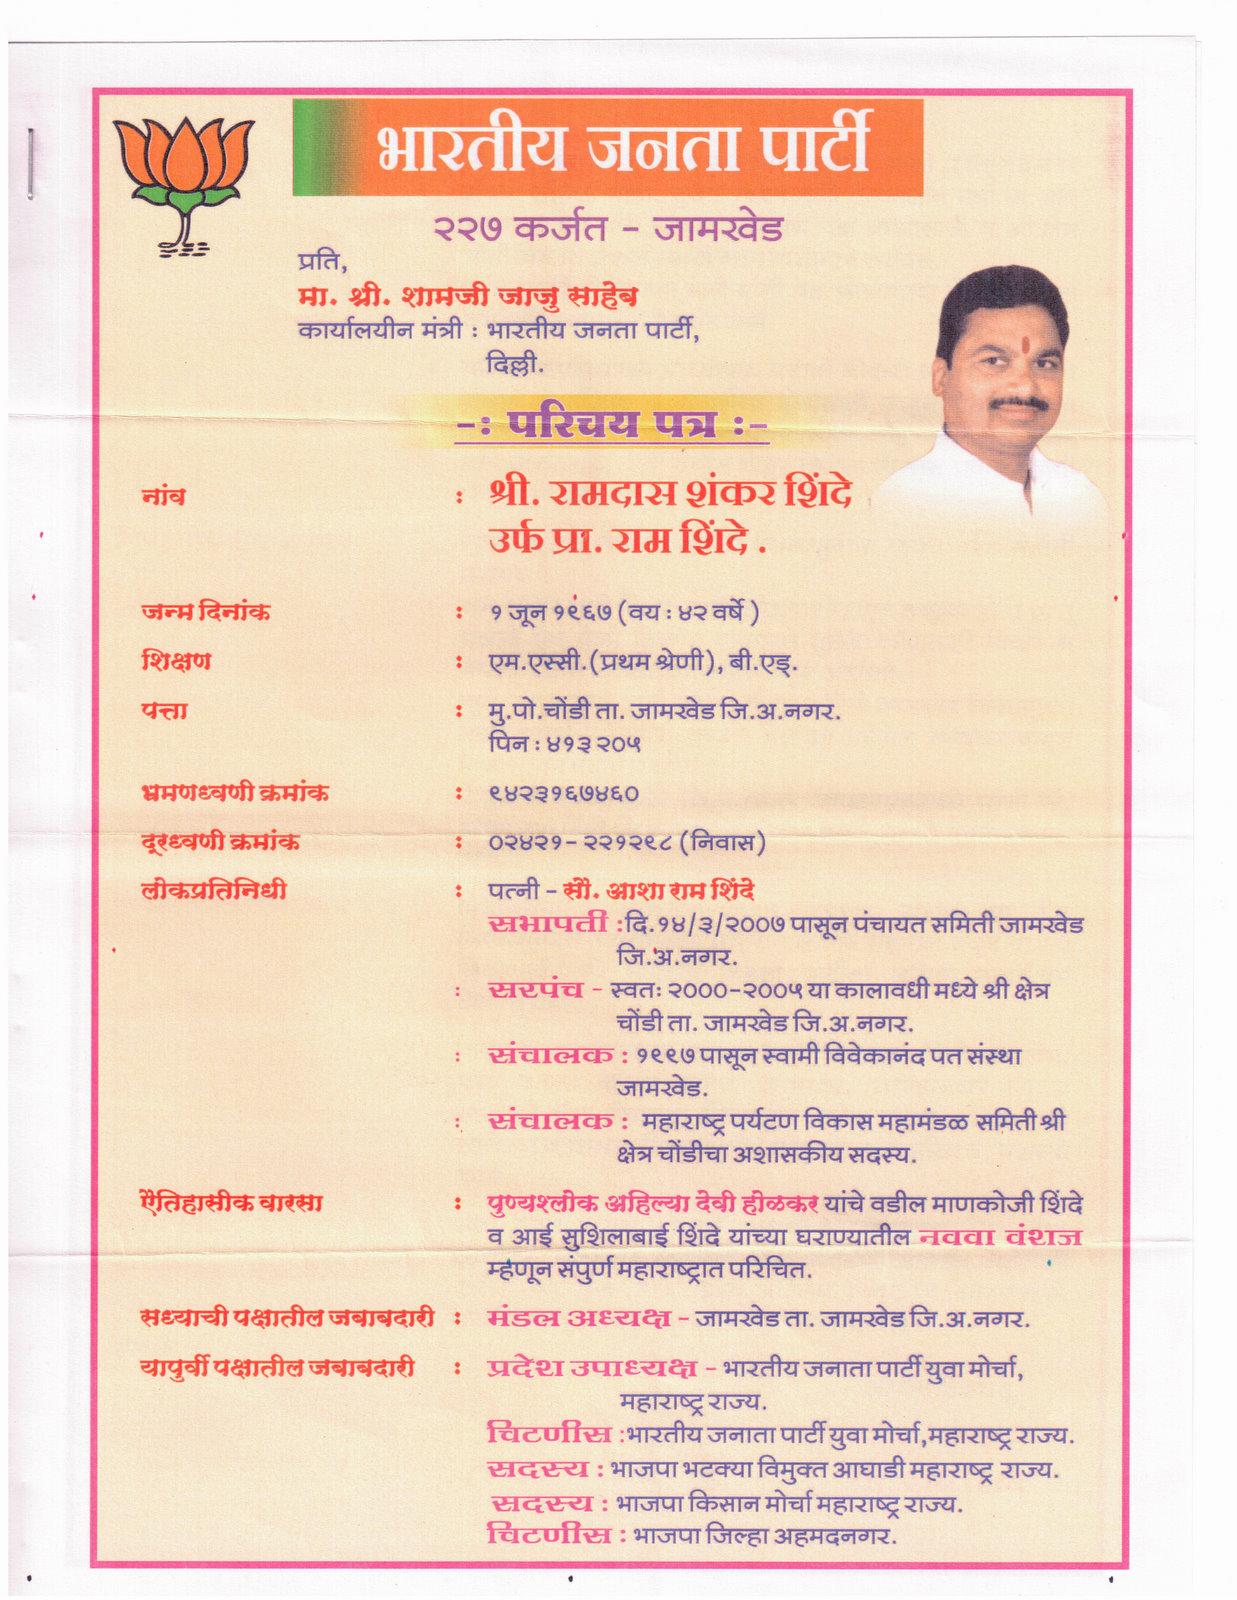 Aamdar Prof. Ram Shinde karjat-Jamkhed